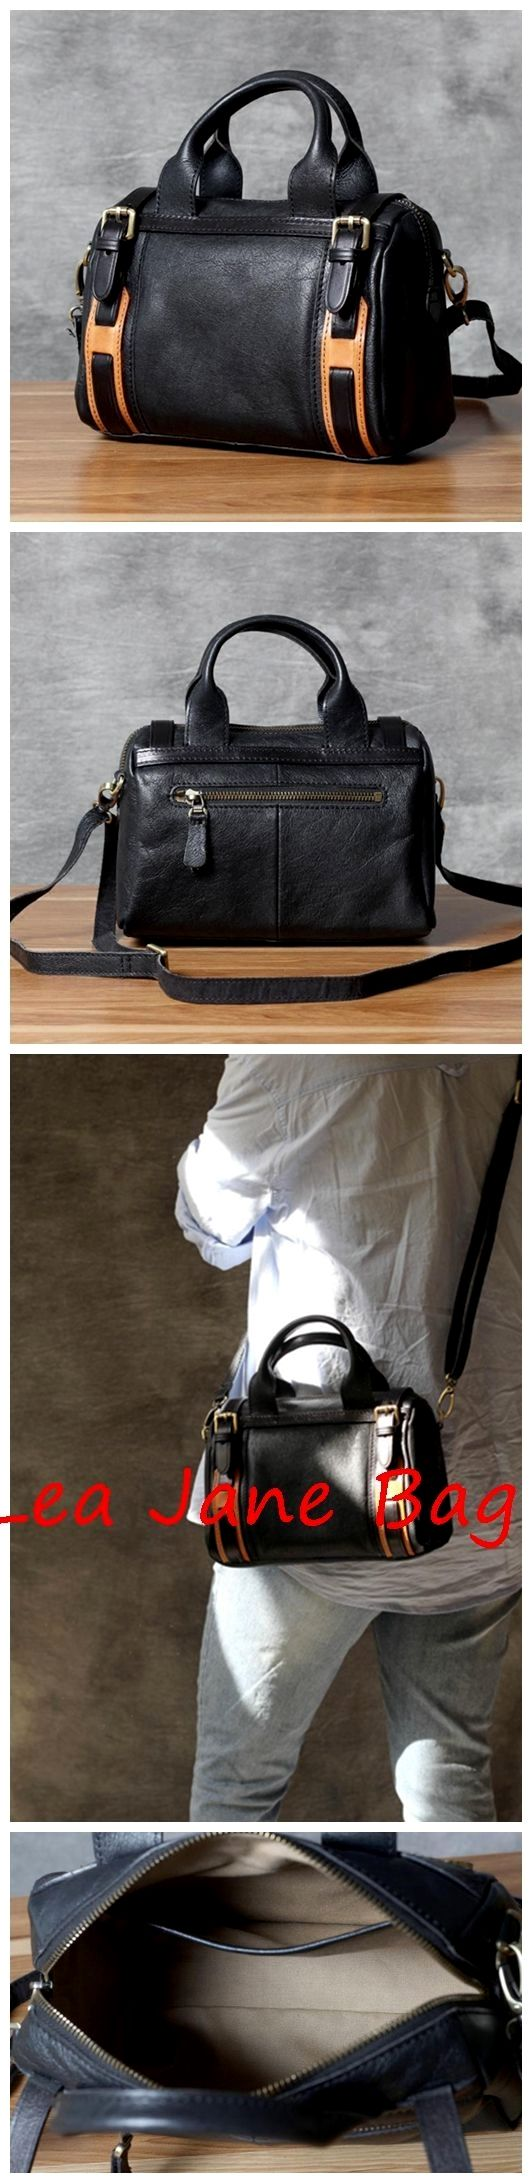 Handmade Genuine Leather Womens Fashion Tote Handbag Shoulder Bag  brand  new 201f8 1ce9b Genuine Leather Tote Bag,Crossbody Shoulder Bag, Handmade  Bag OAK ... 293b6f5e50